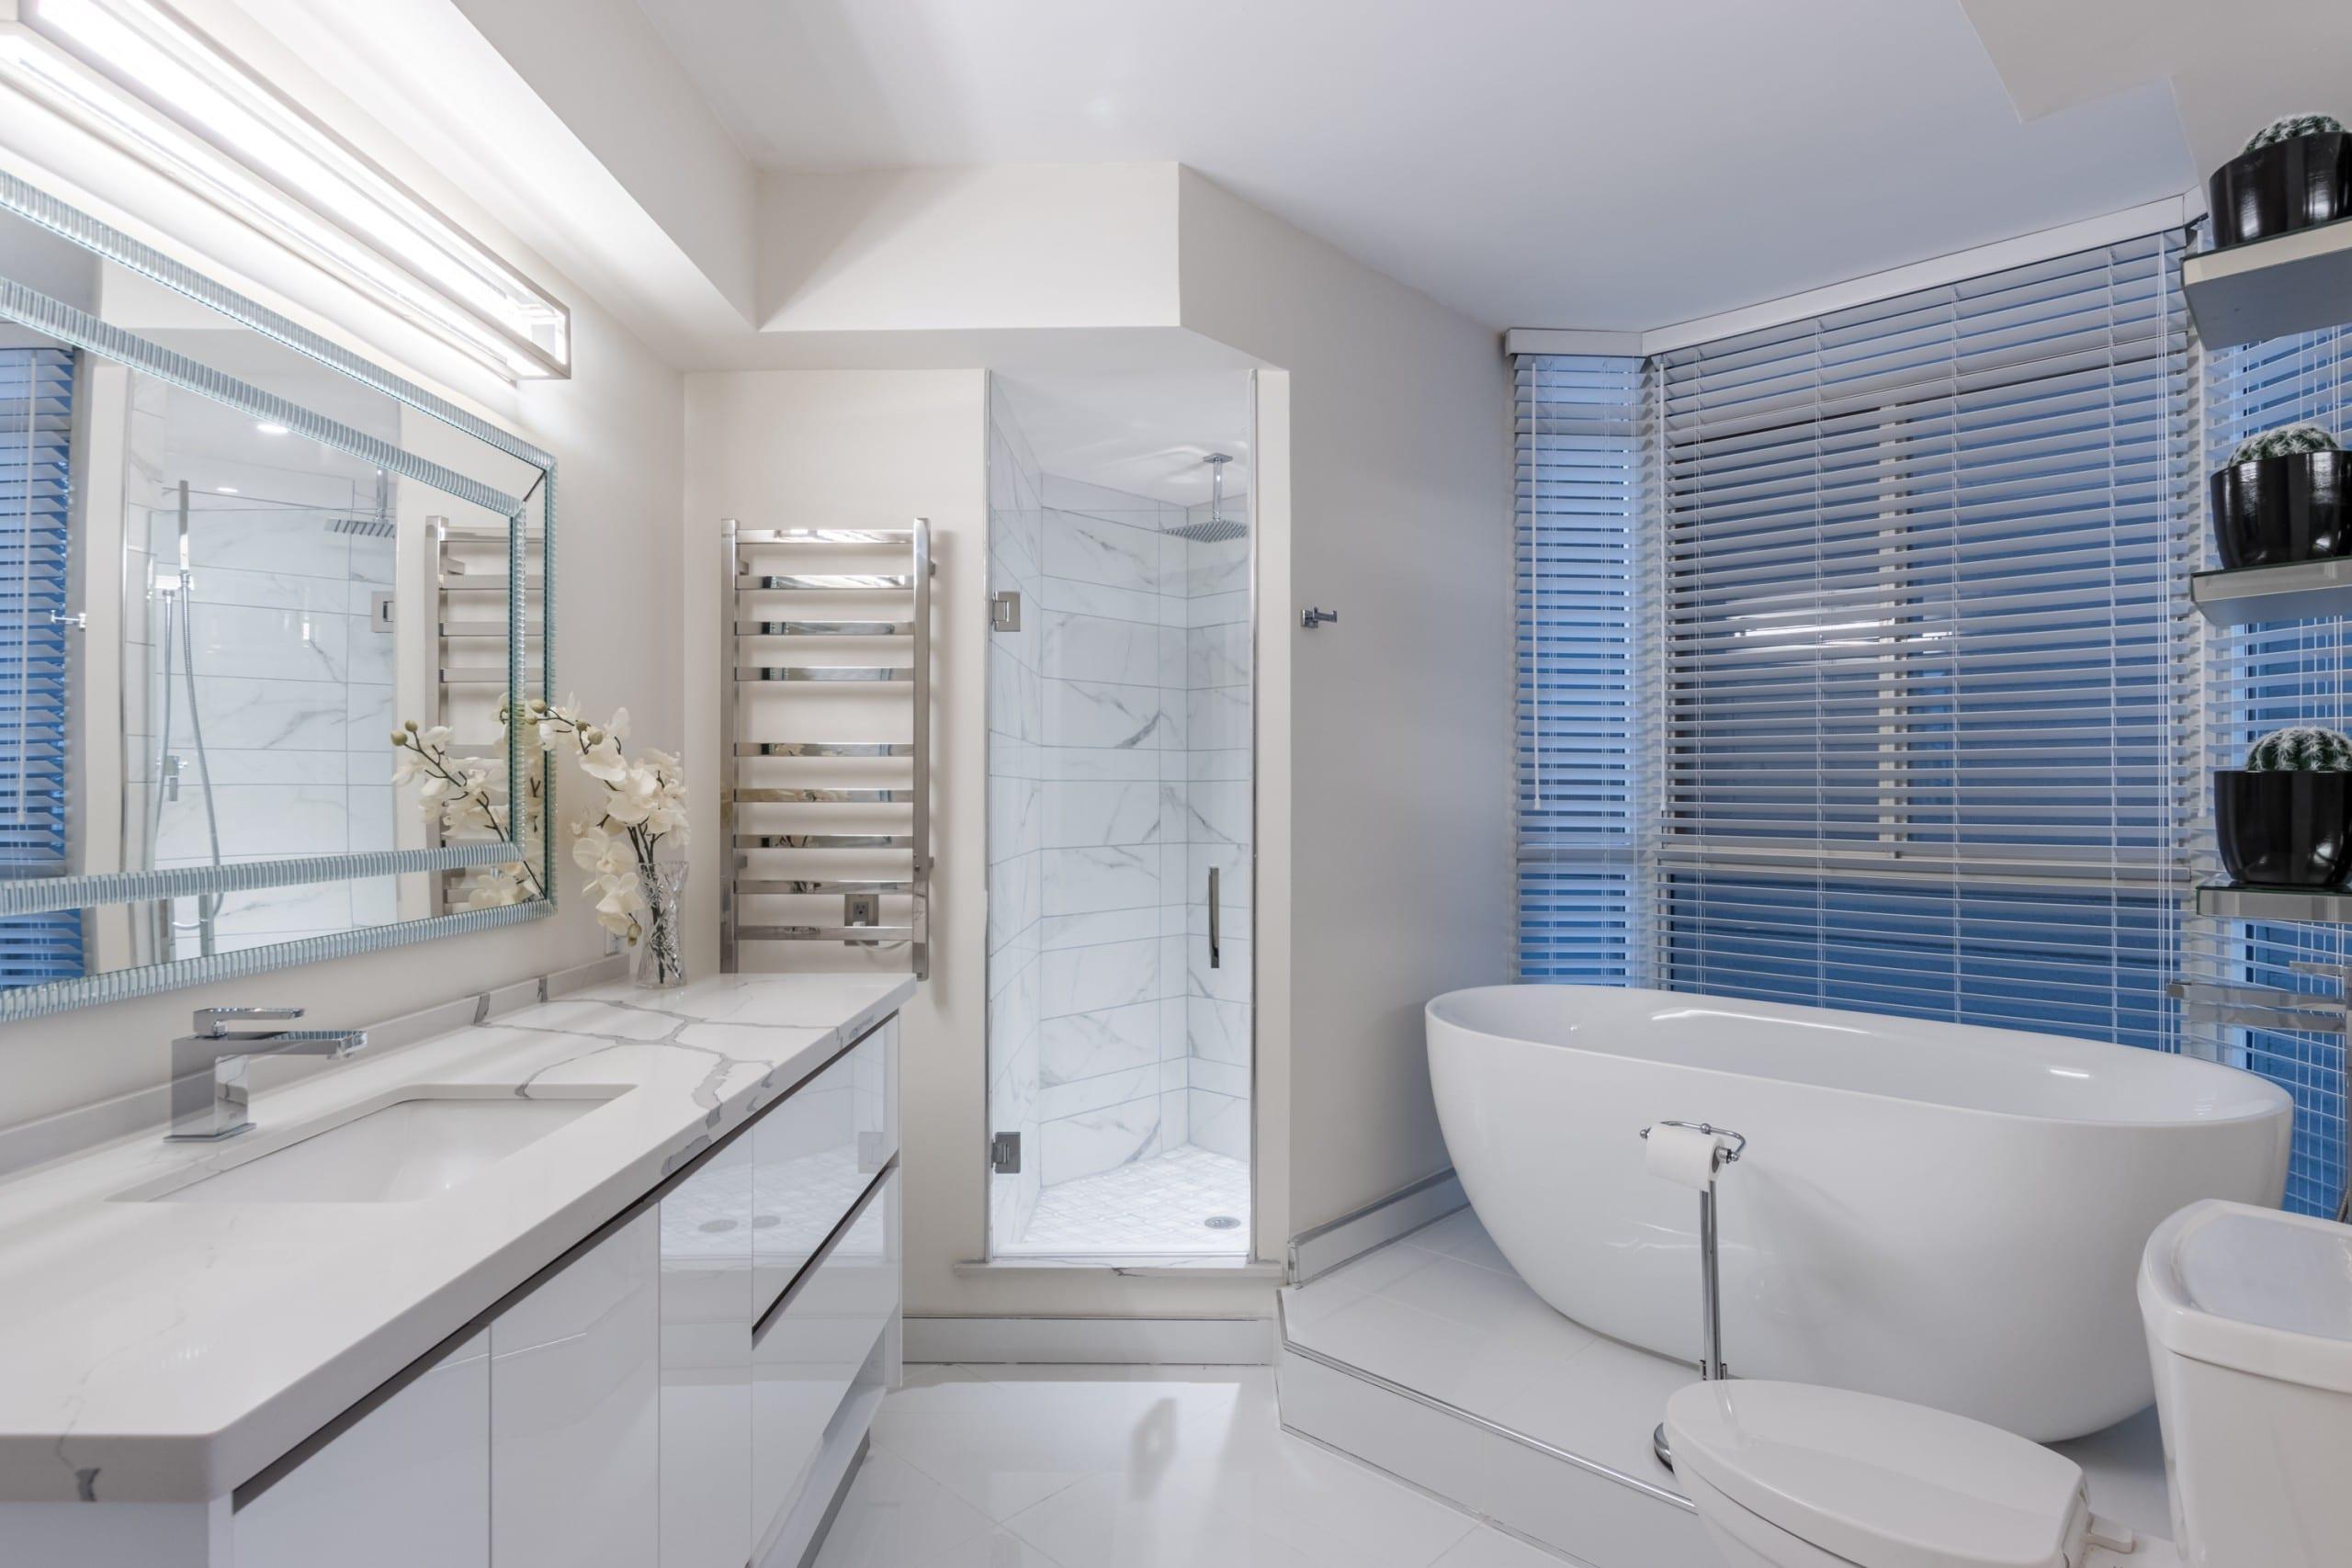 Bathroom featured at 508 – 415 Locust Street, Burlington, ON at Alex Irish & Associates